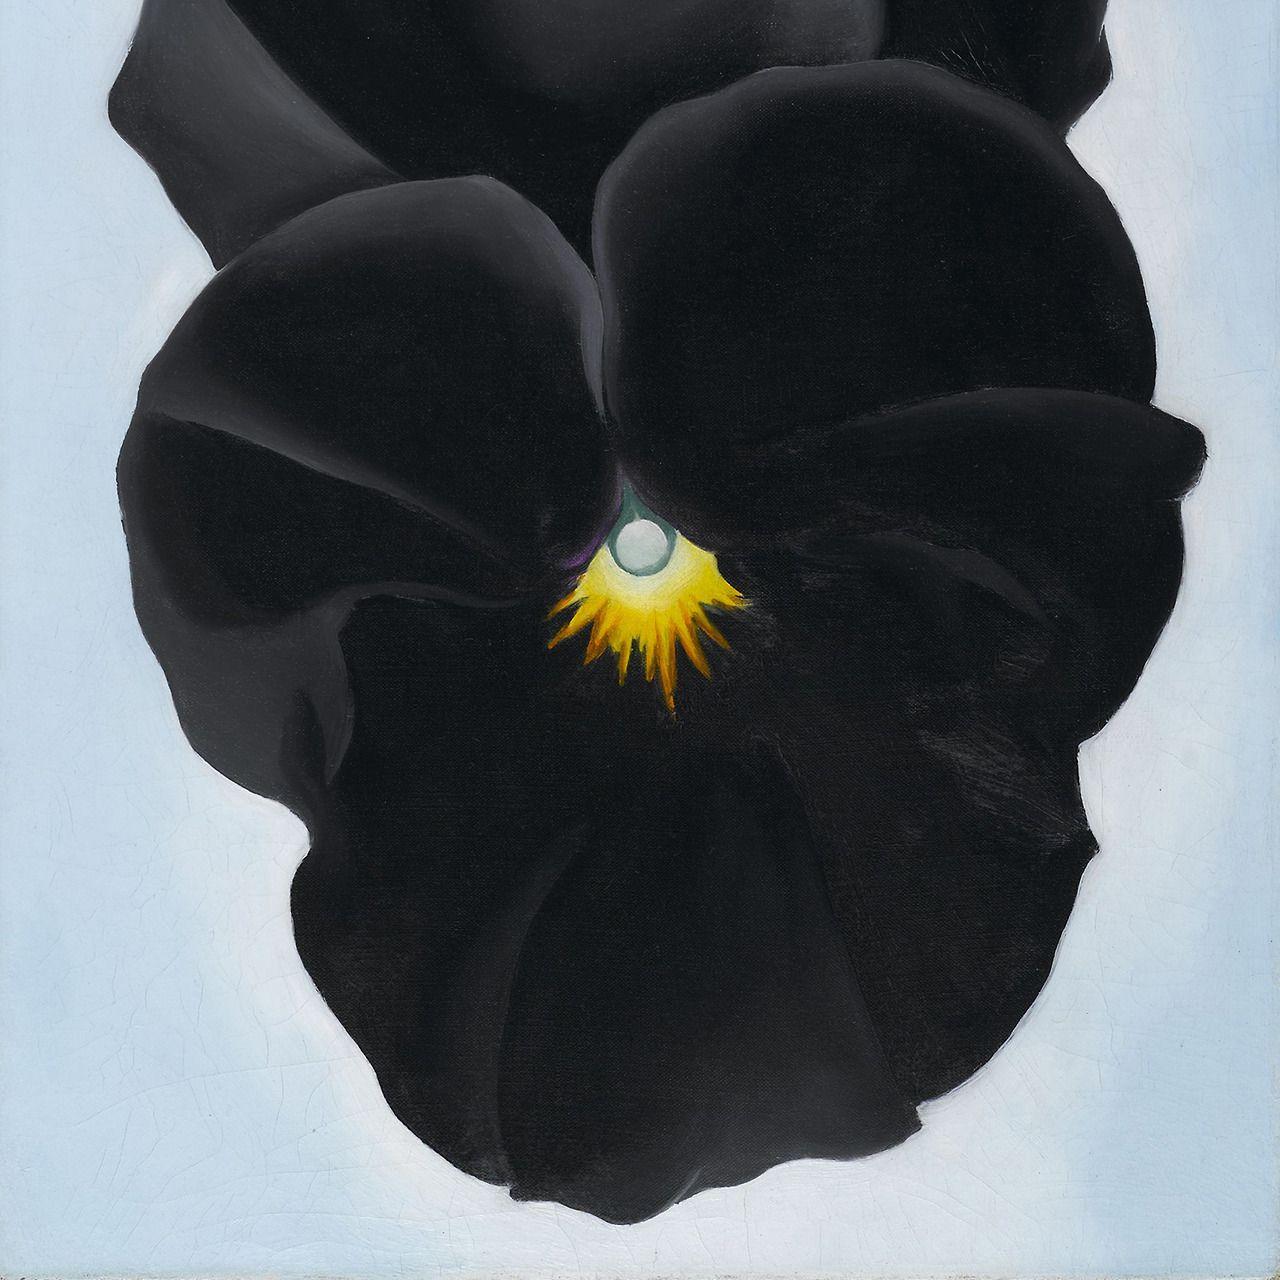 Jimlovesart Georgia Okeeffe Black Pansy 1927 Art